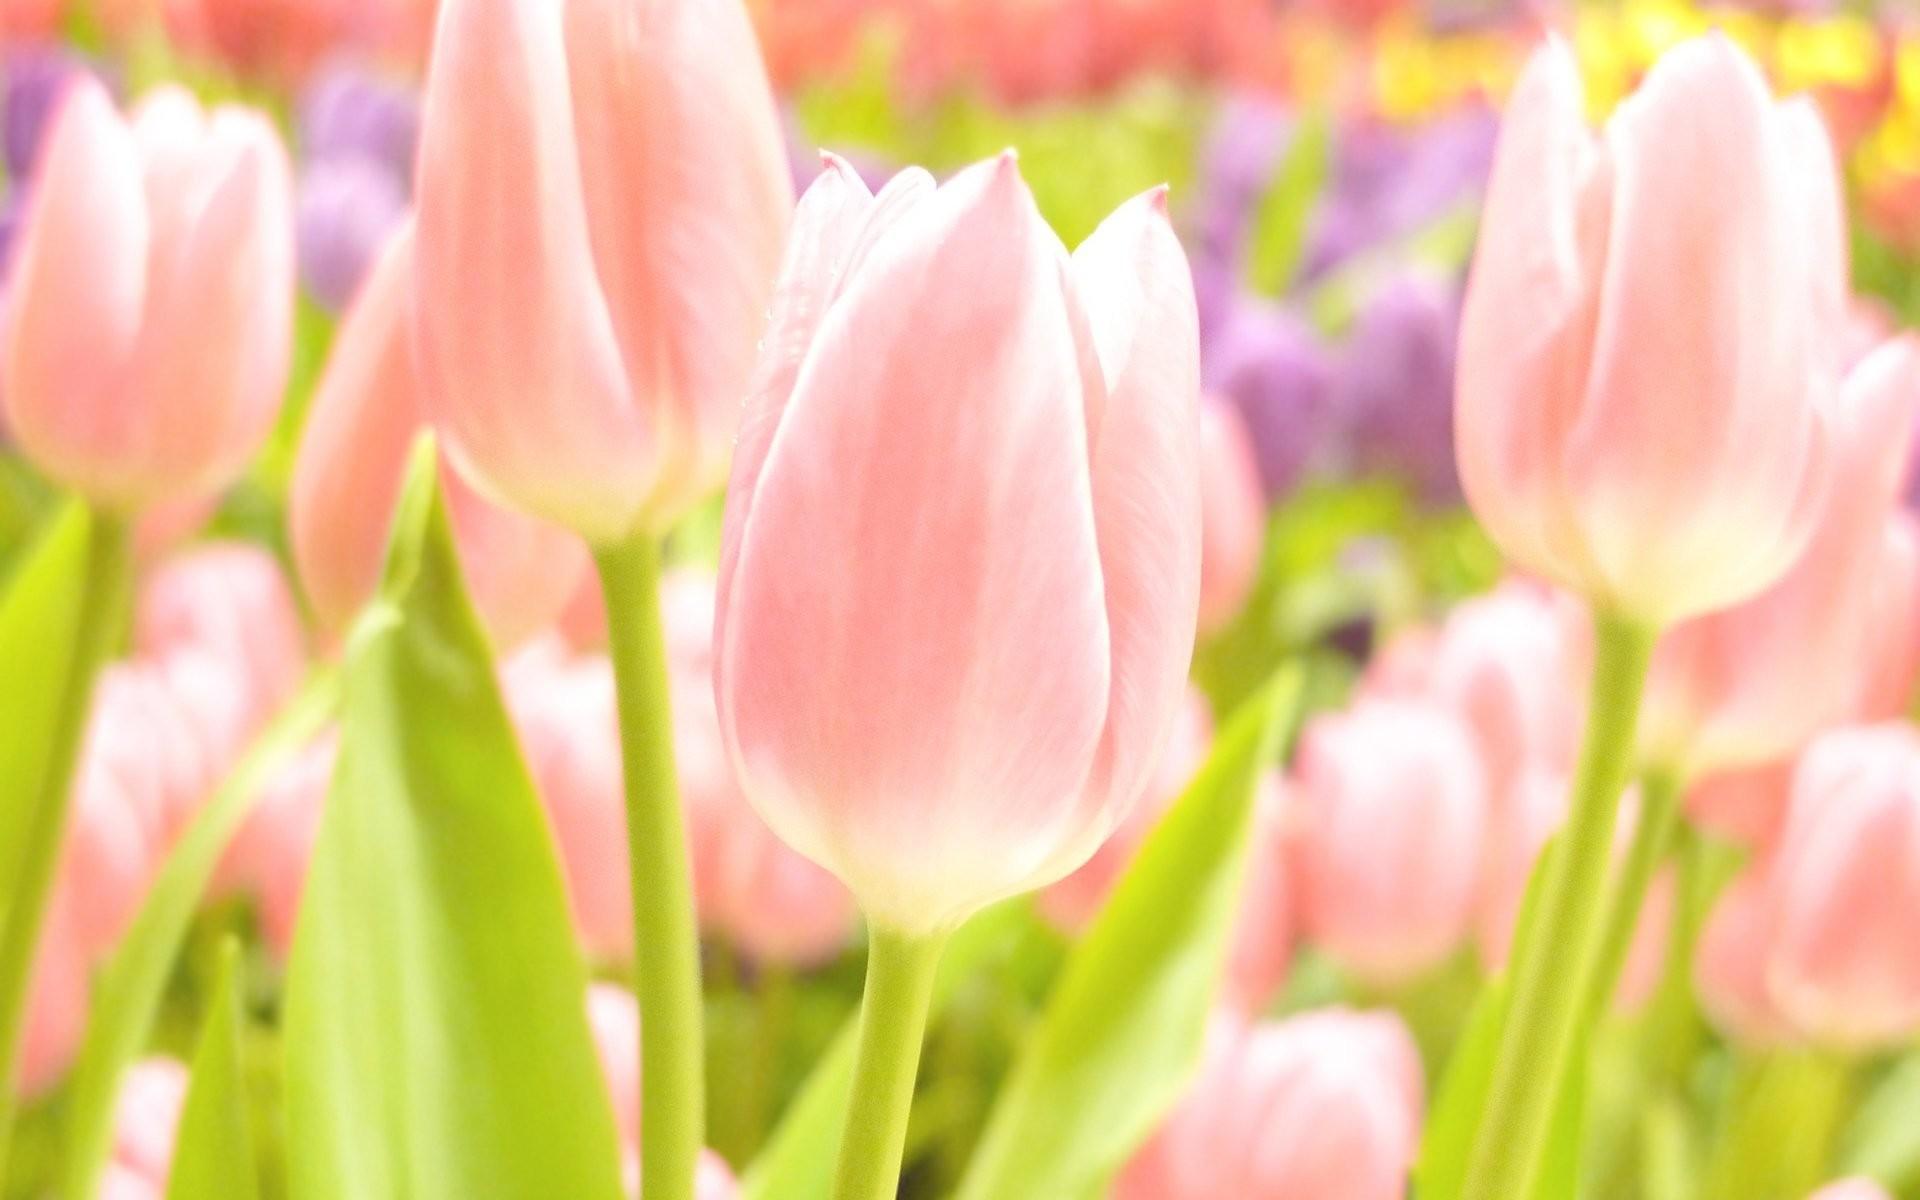 flower summer spring summer wallpapers spring wallpaper tulips focus bokeh  pink yellow white tender sweet tulips